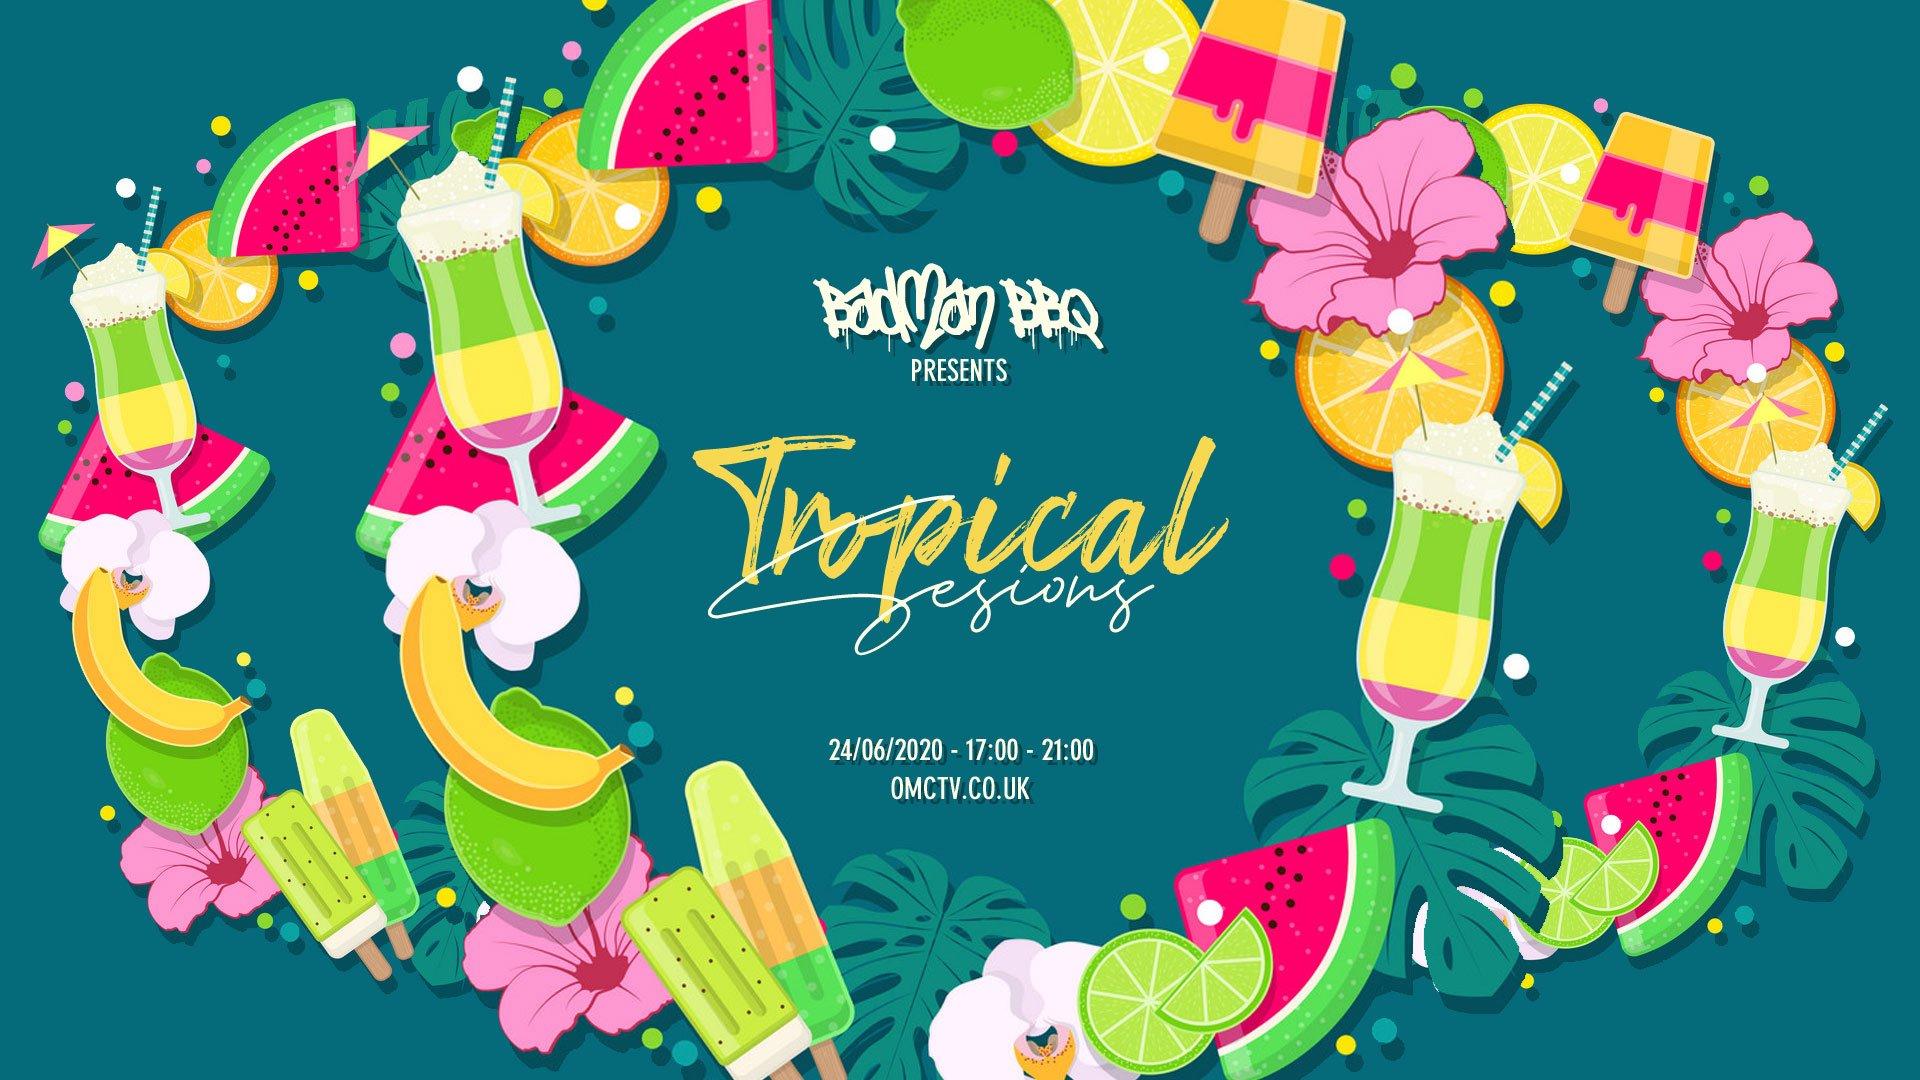 Badman BBQ Presents 'Tropical Sessions'